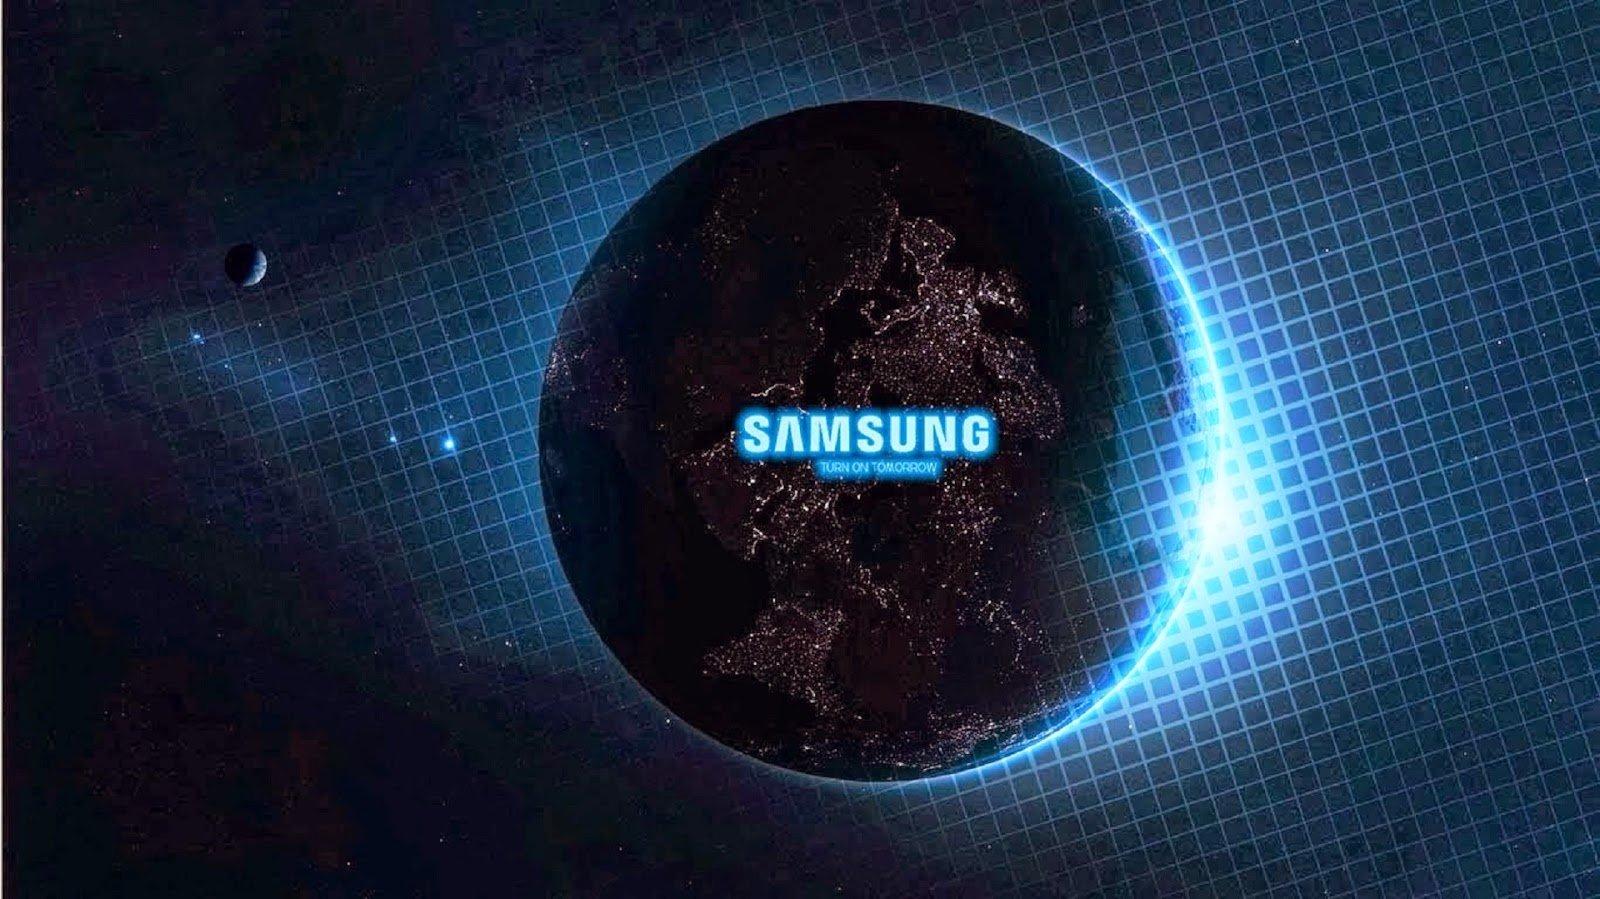 Samsung Logo Wallpaper 1600x899